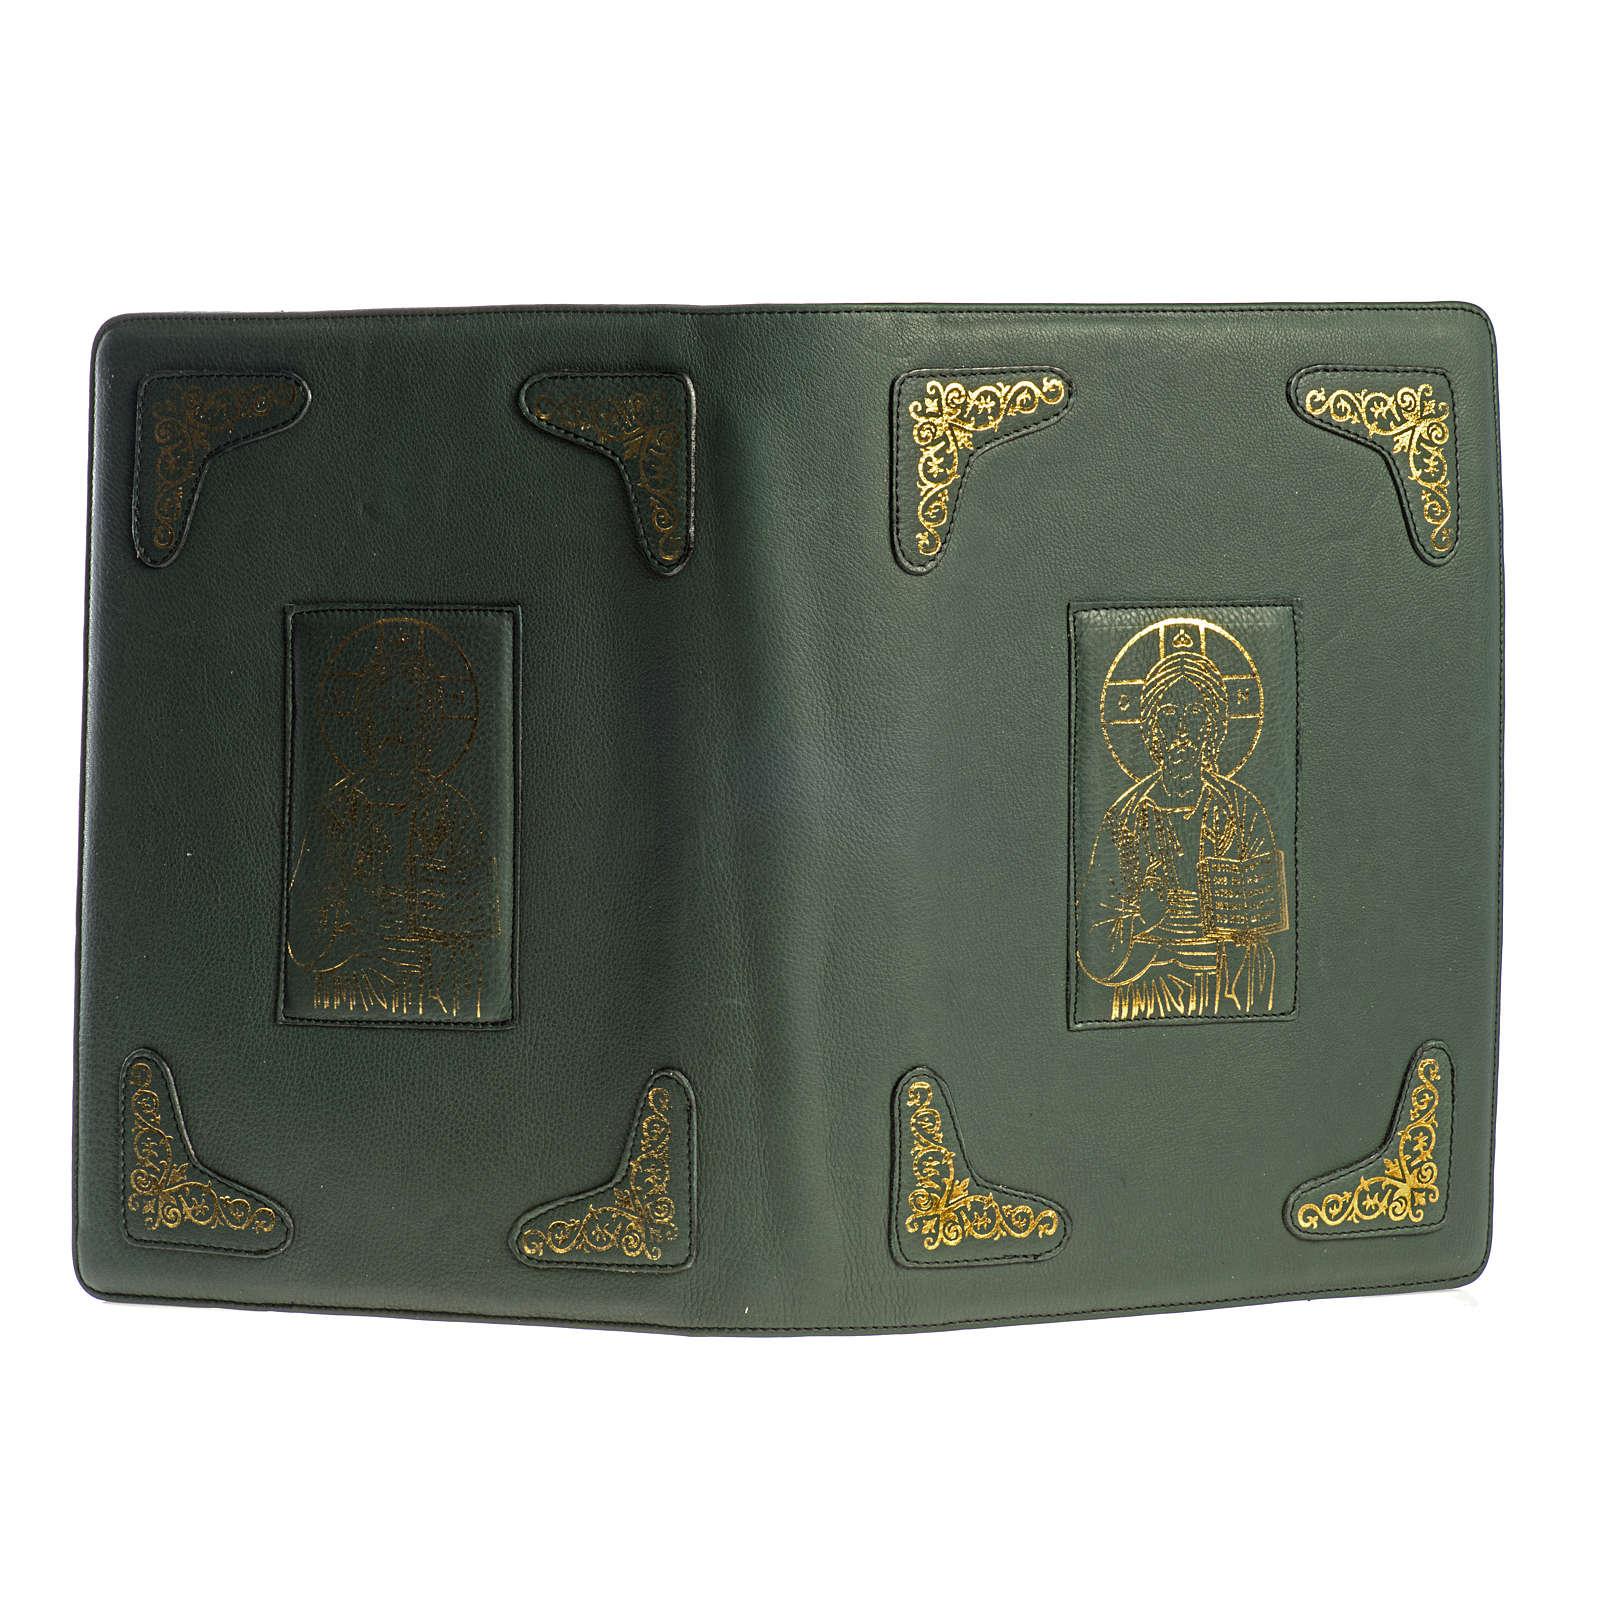 Capa para Missal Romano verde impressão ouro 4